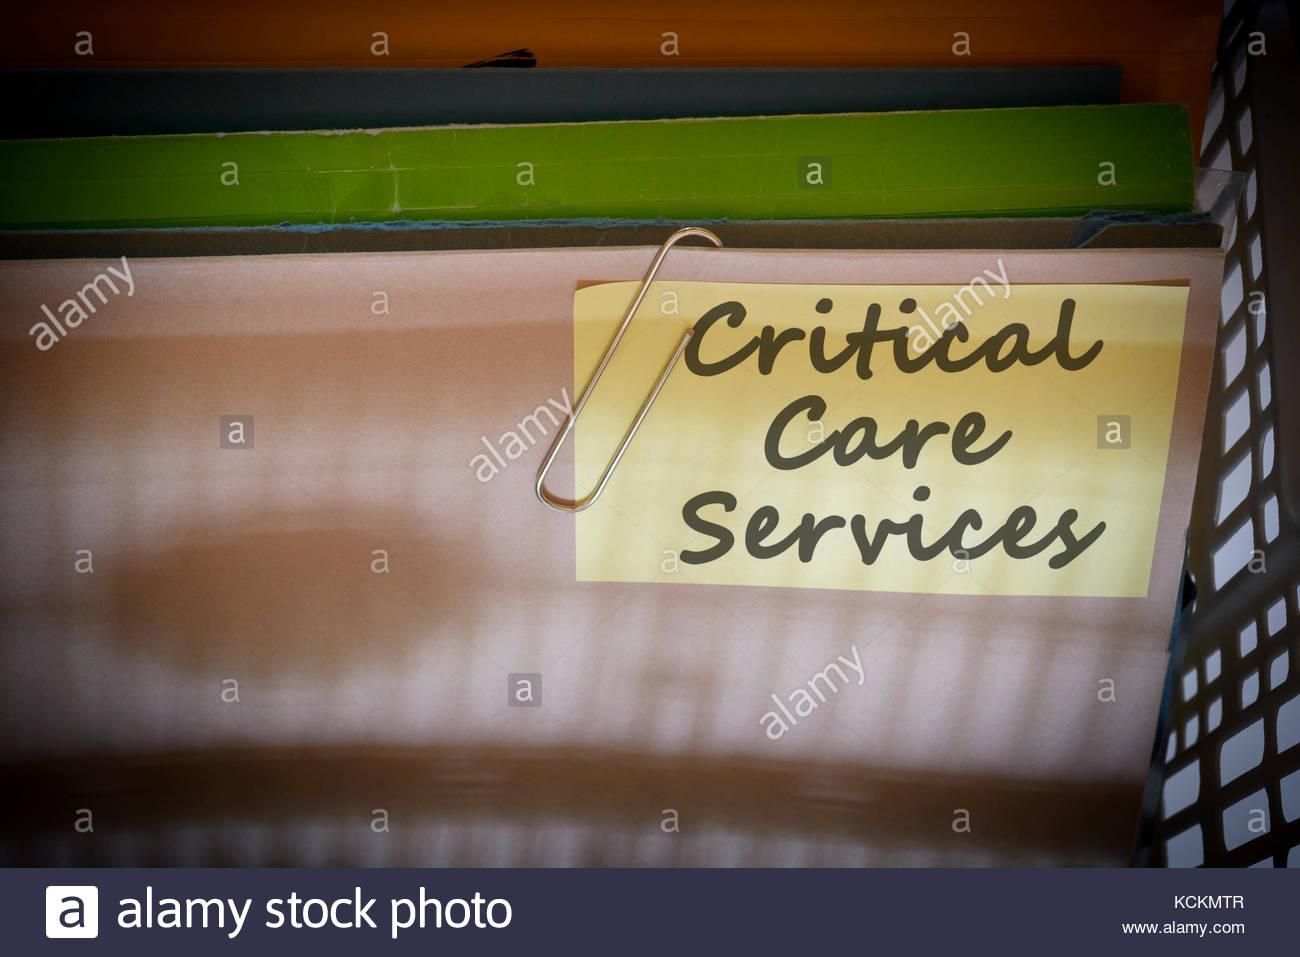 Critical Care Services written on document folder, Dorset, England. - Stock Image